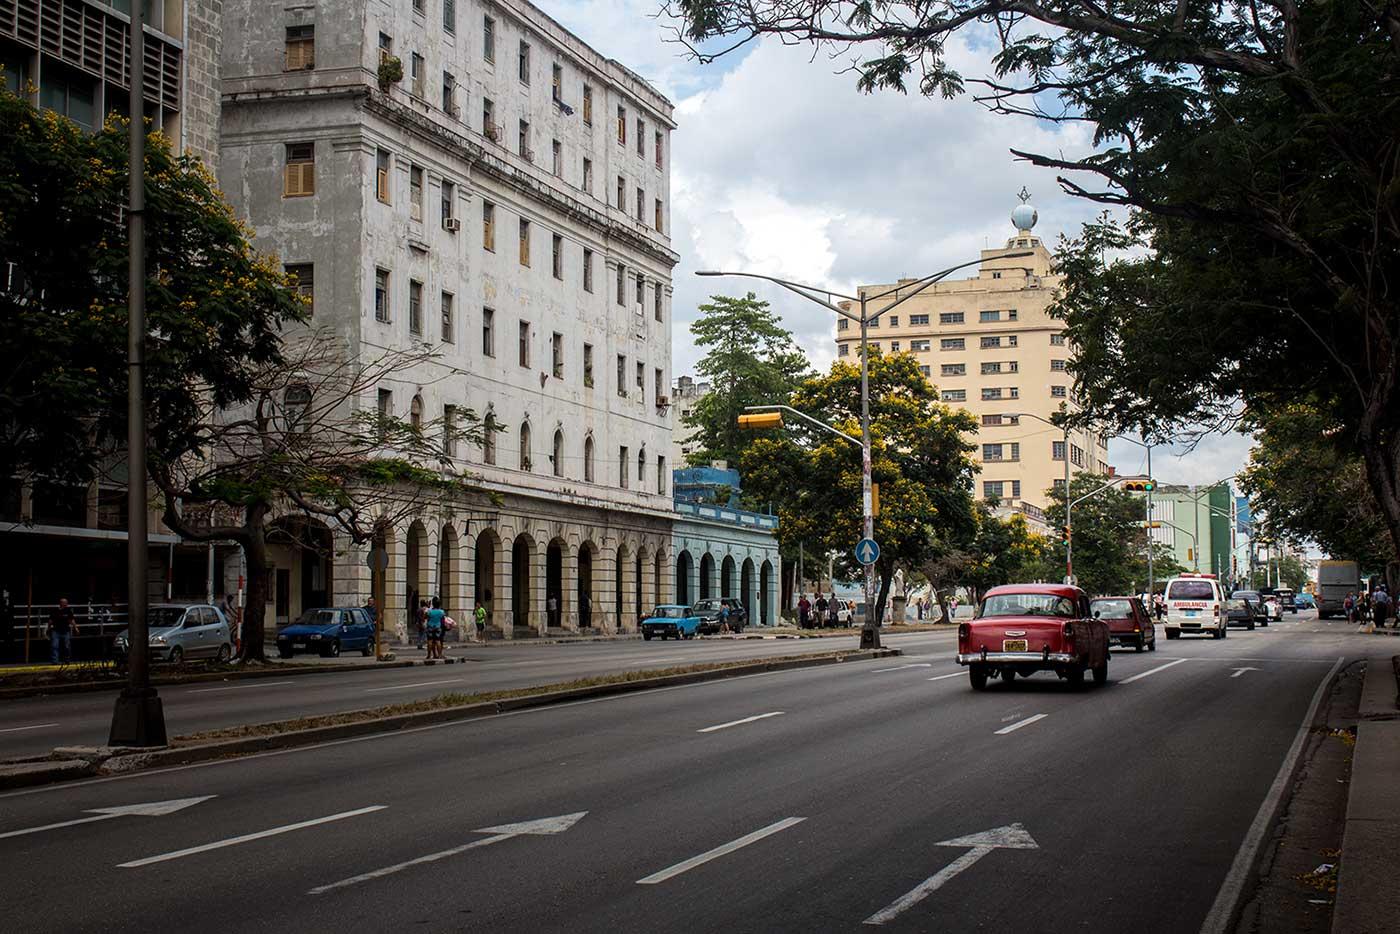 The 11-storey Grand Lodge of Cuba towers over Avenida Salvador Allende in Havana.